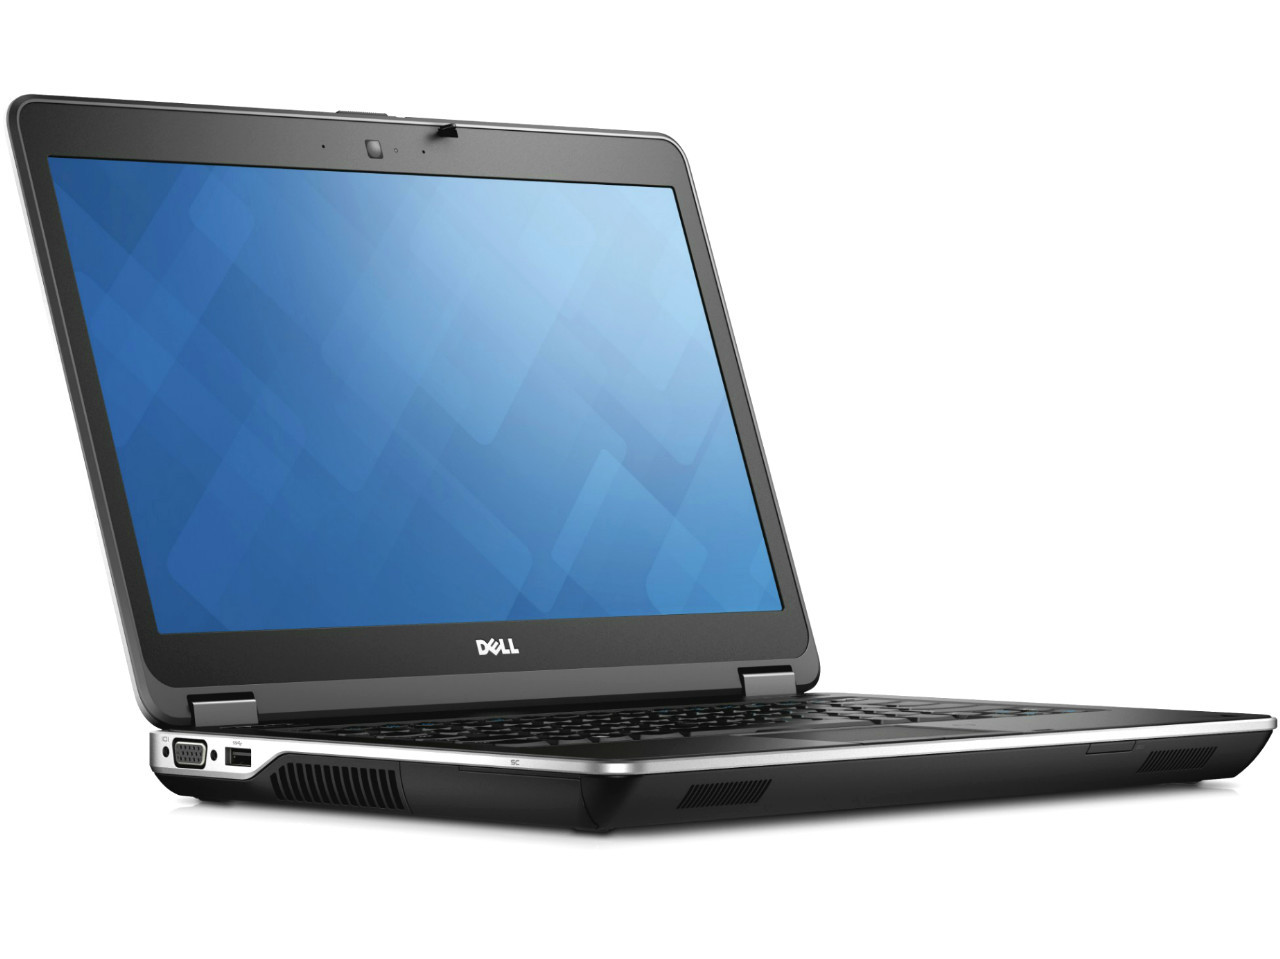 Dell Latitude E6440 Laptop Core i5 2.6GHz, 16GB Ram, 256GB SSD, DVD-RW, Windows 10 Pro 64 Notebook